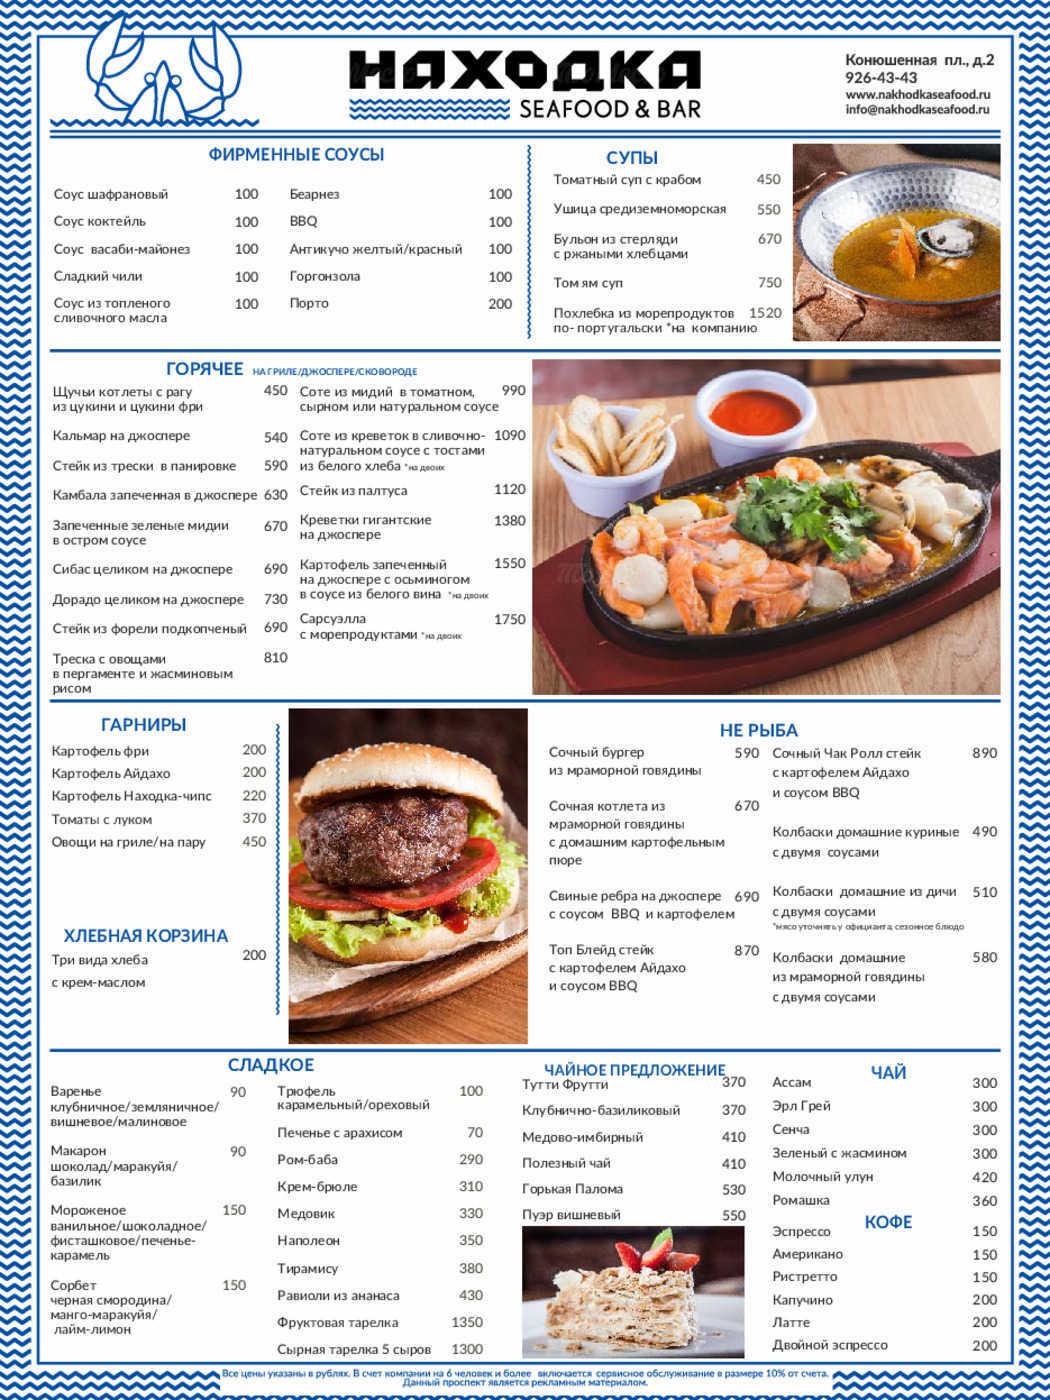 Меню ресторана Находка seafood&bar на Конюшенной площади